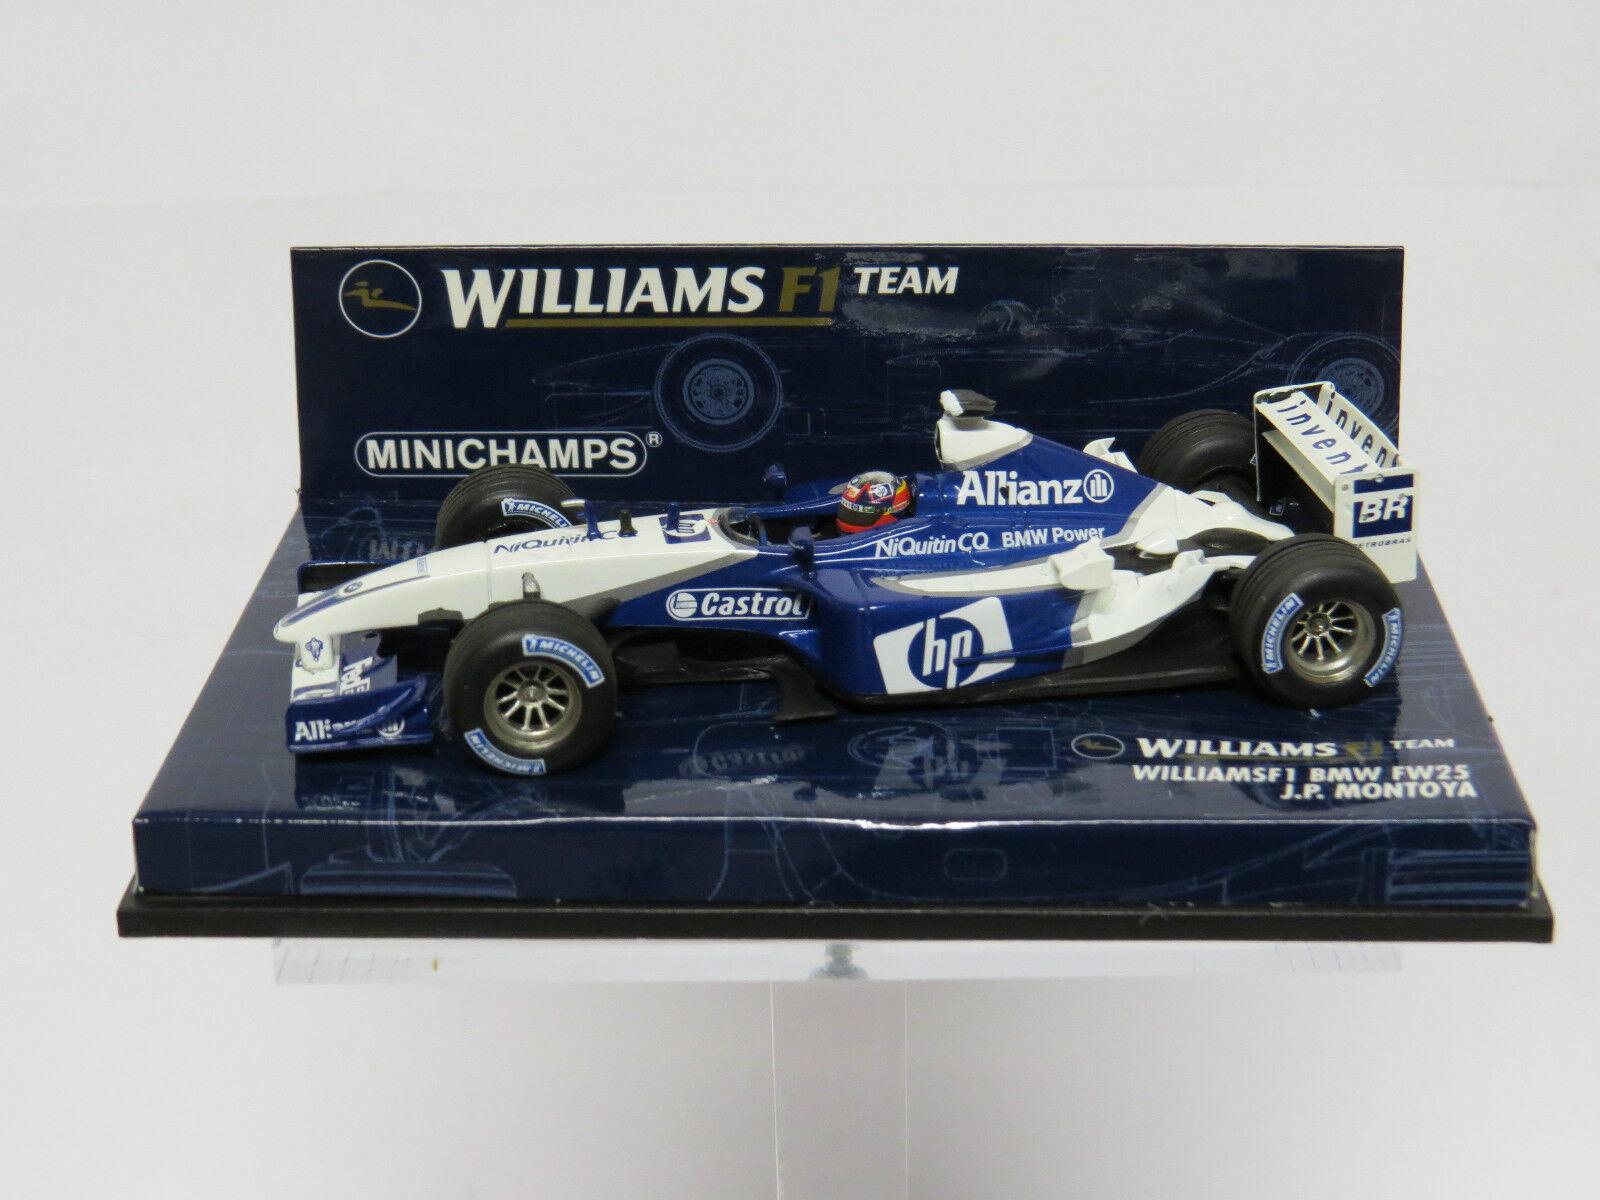 Modellbau Matchbox Superfast Racing Car Formula 1 Zustand Top Auto- & Verkehrsmodelle